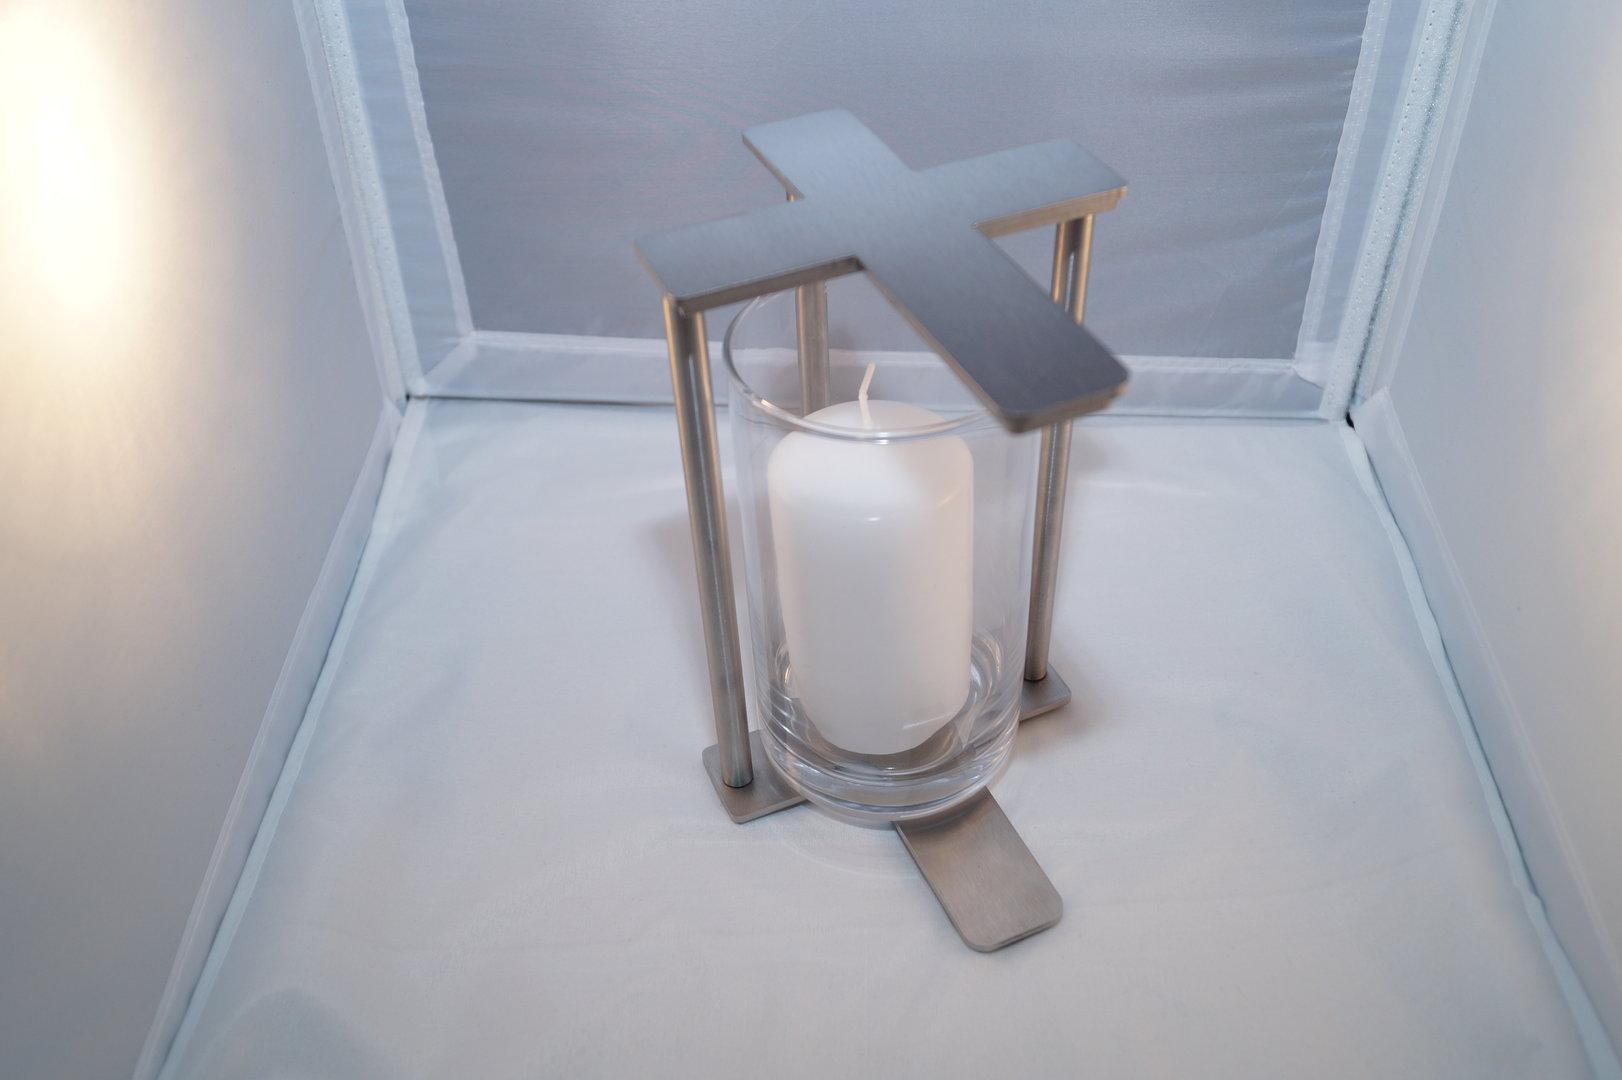 windlicht grablicht laterne rostfrei kreuz k s e shop. Black Bedroom Furniture Sets. Home Design Ideas